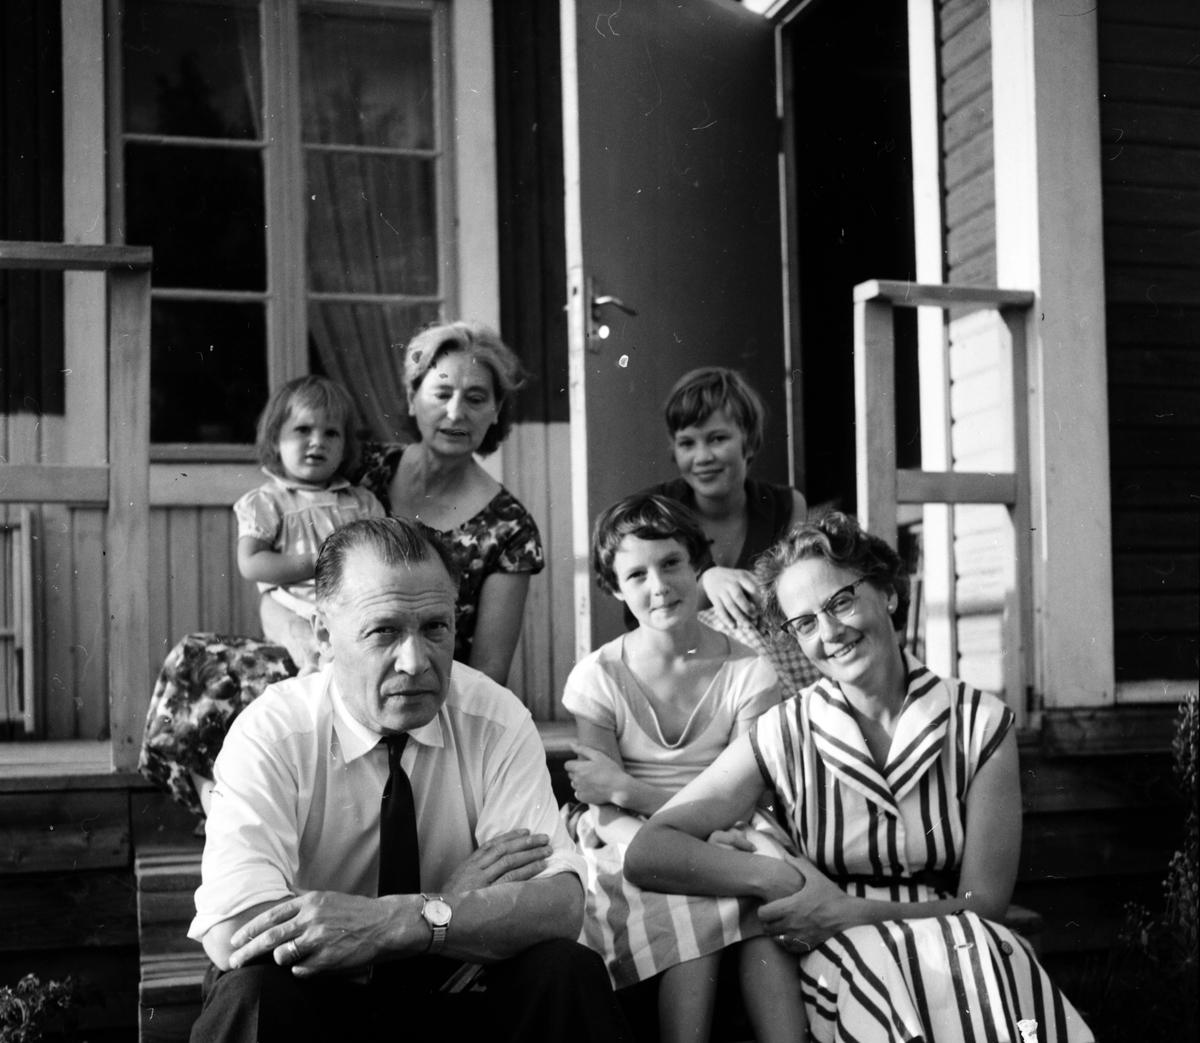 Belse Hanebo, Gust. Nordanås torp rustas, 20 juli 1959